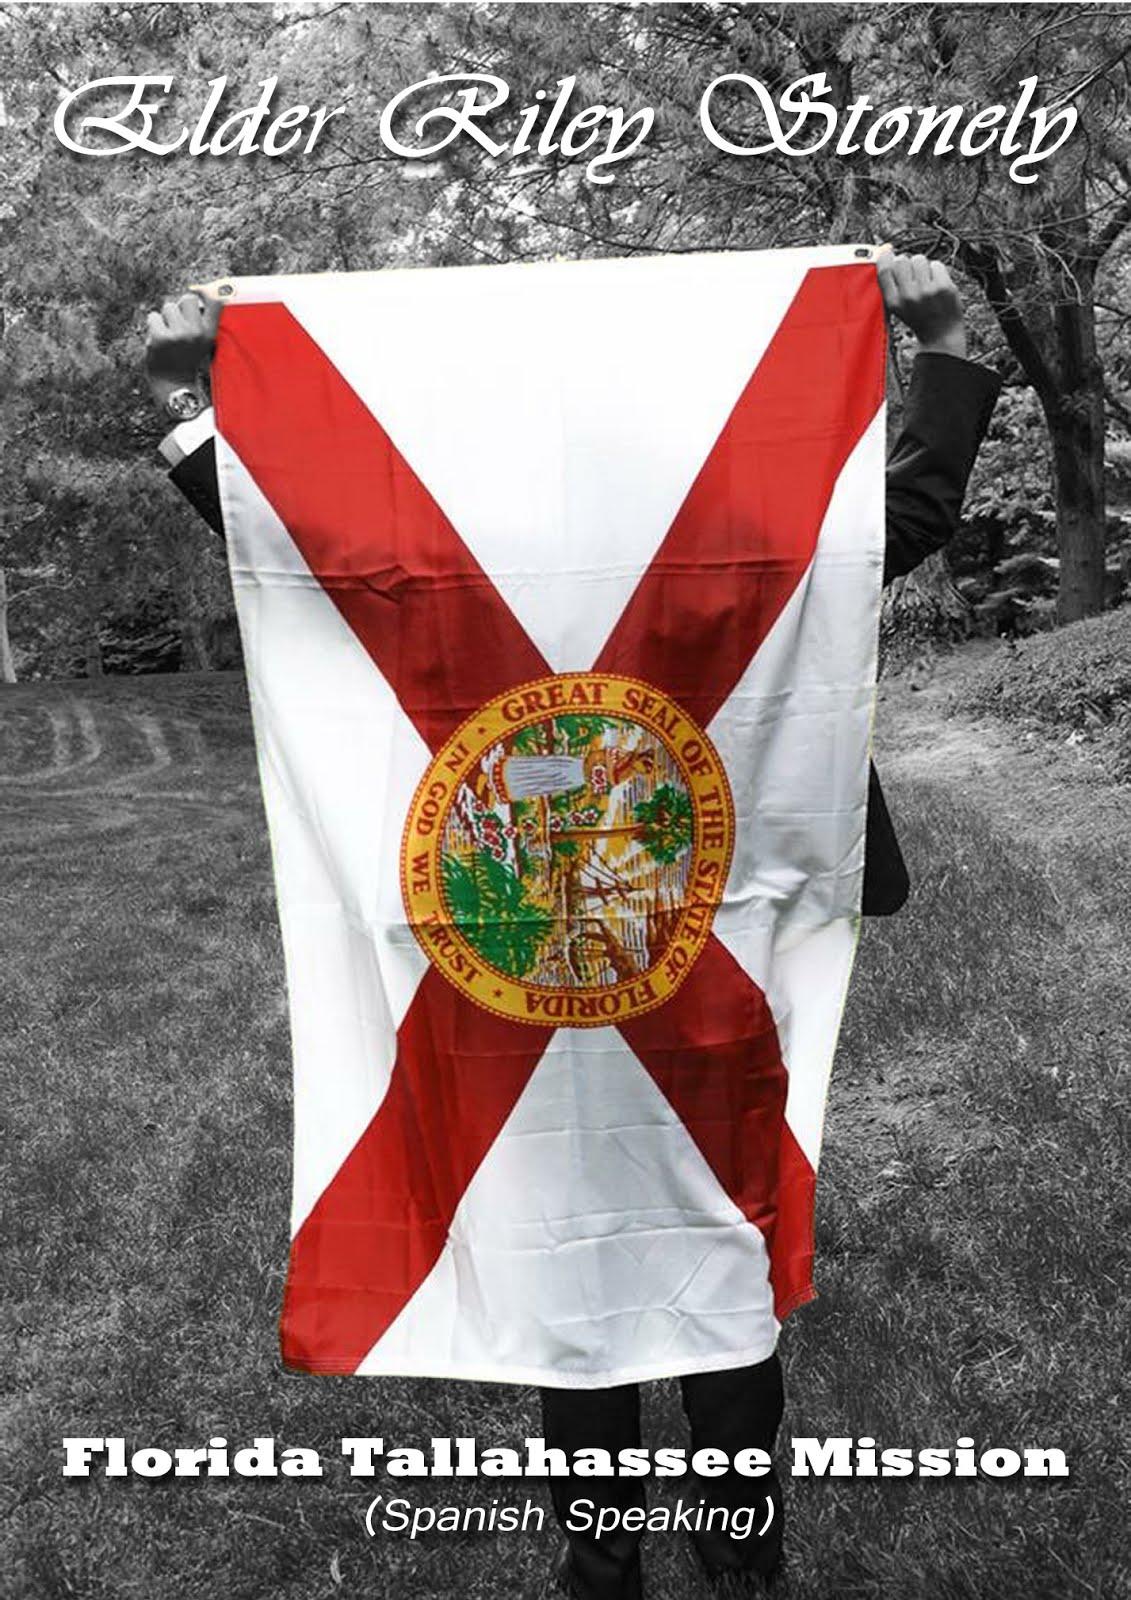 Florida Tallahassee Mission